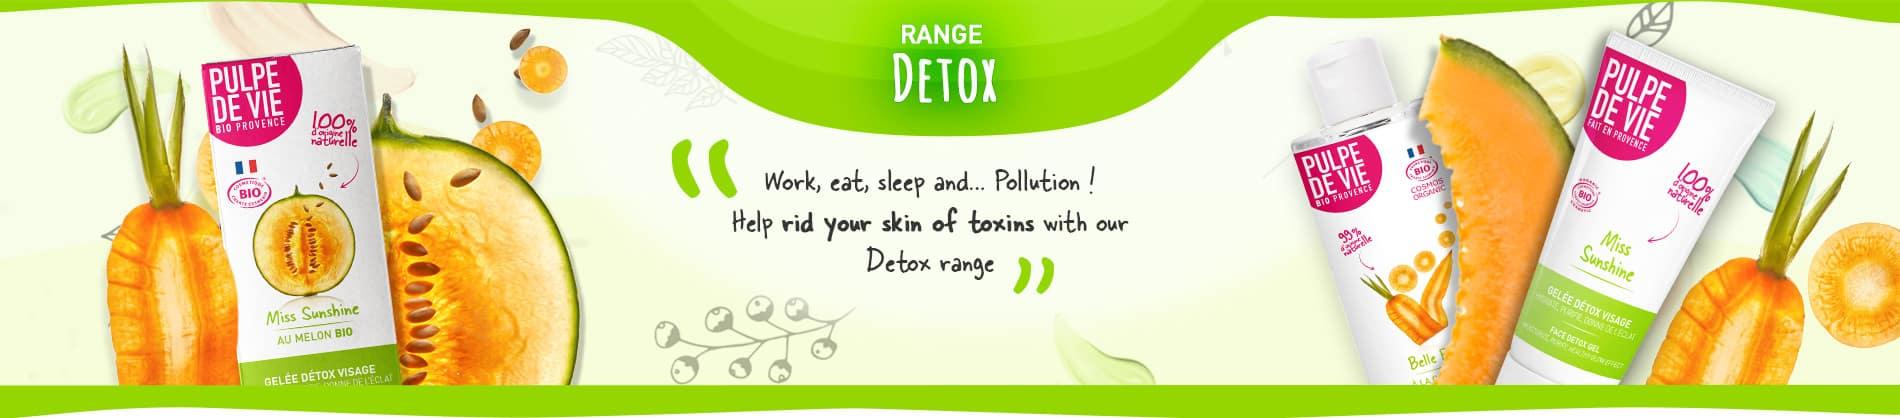 Detox Range